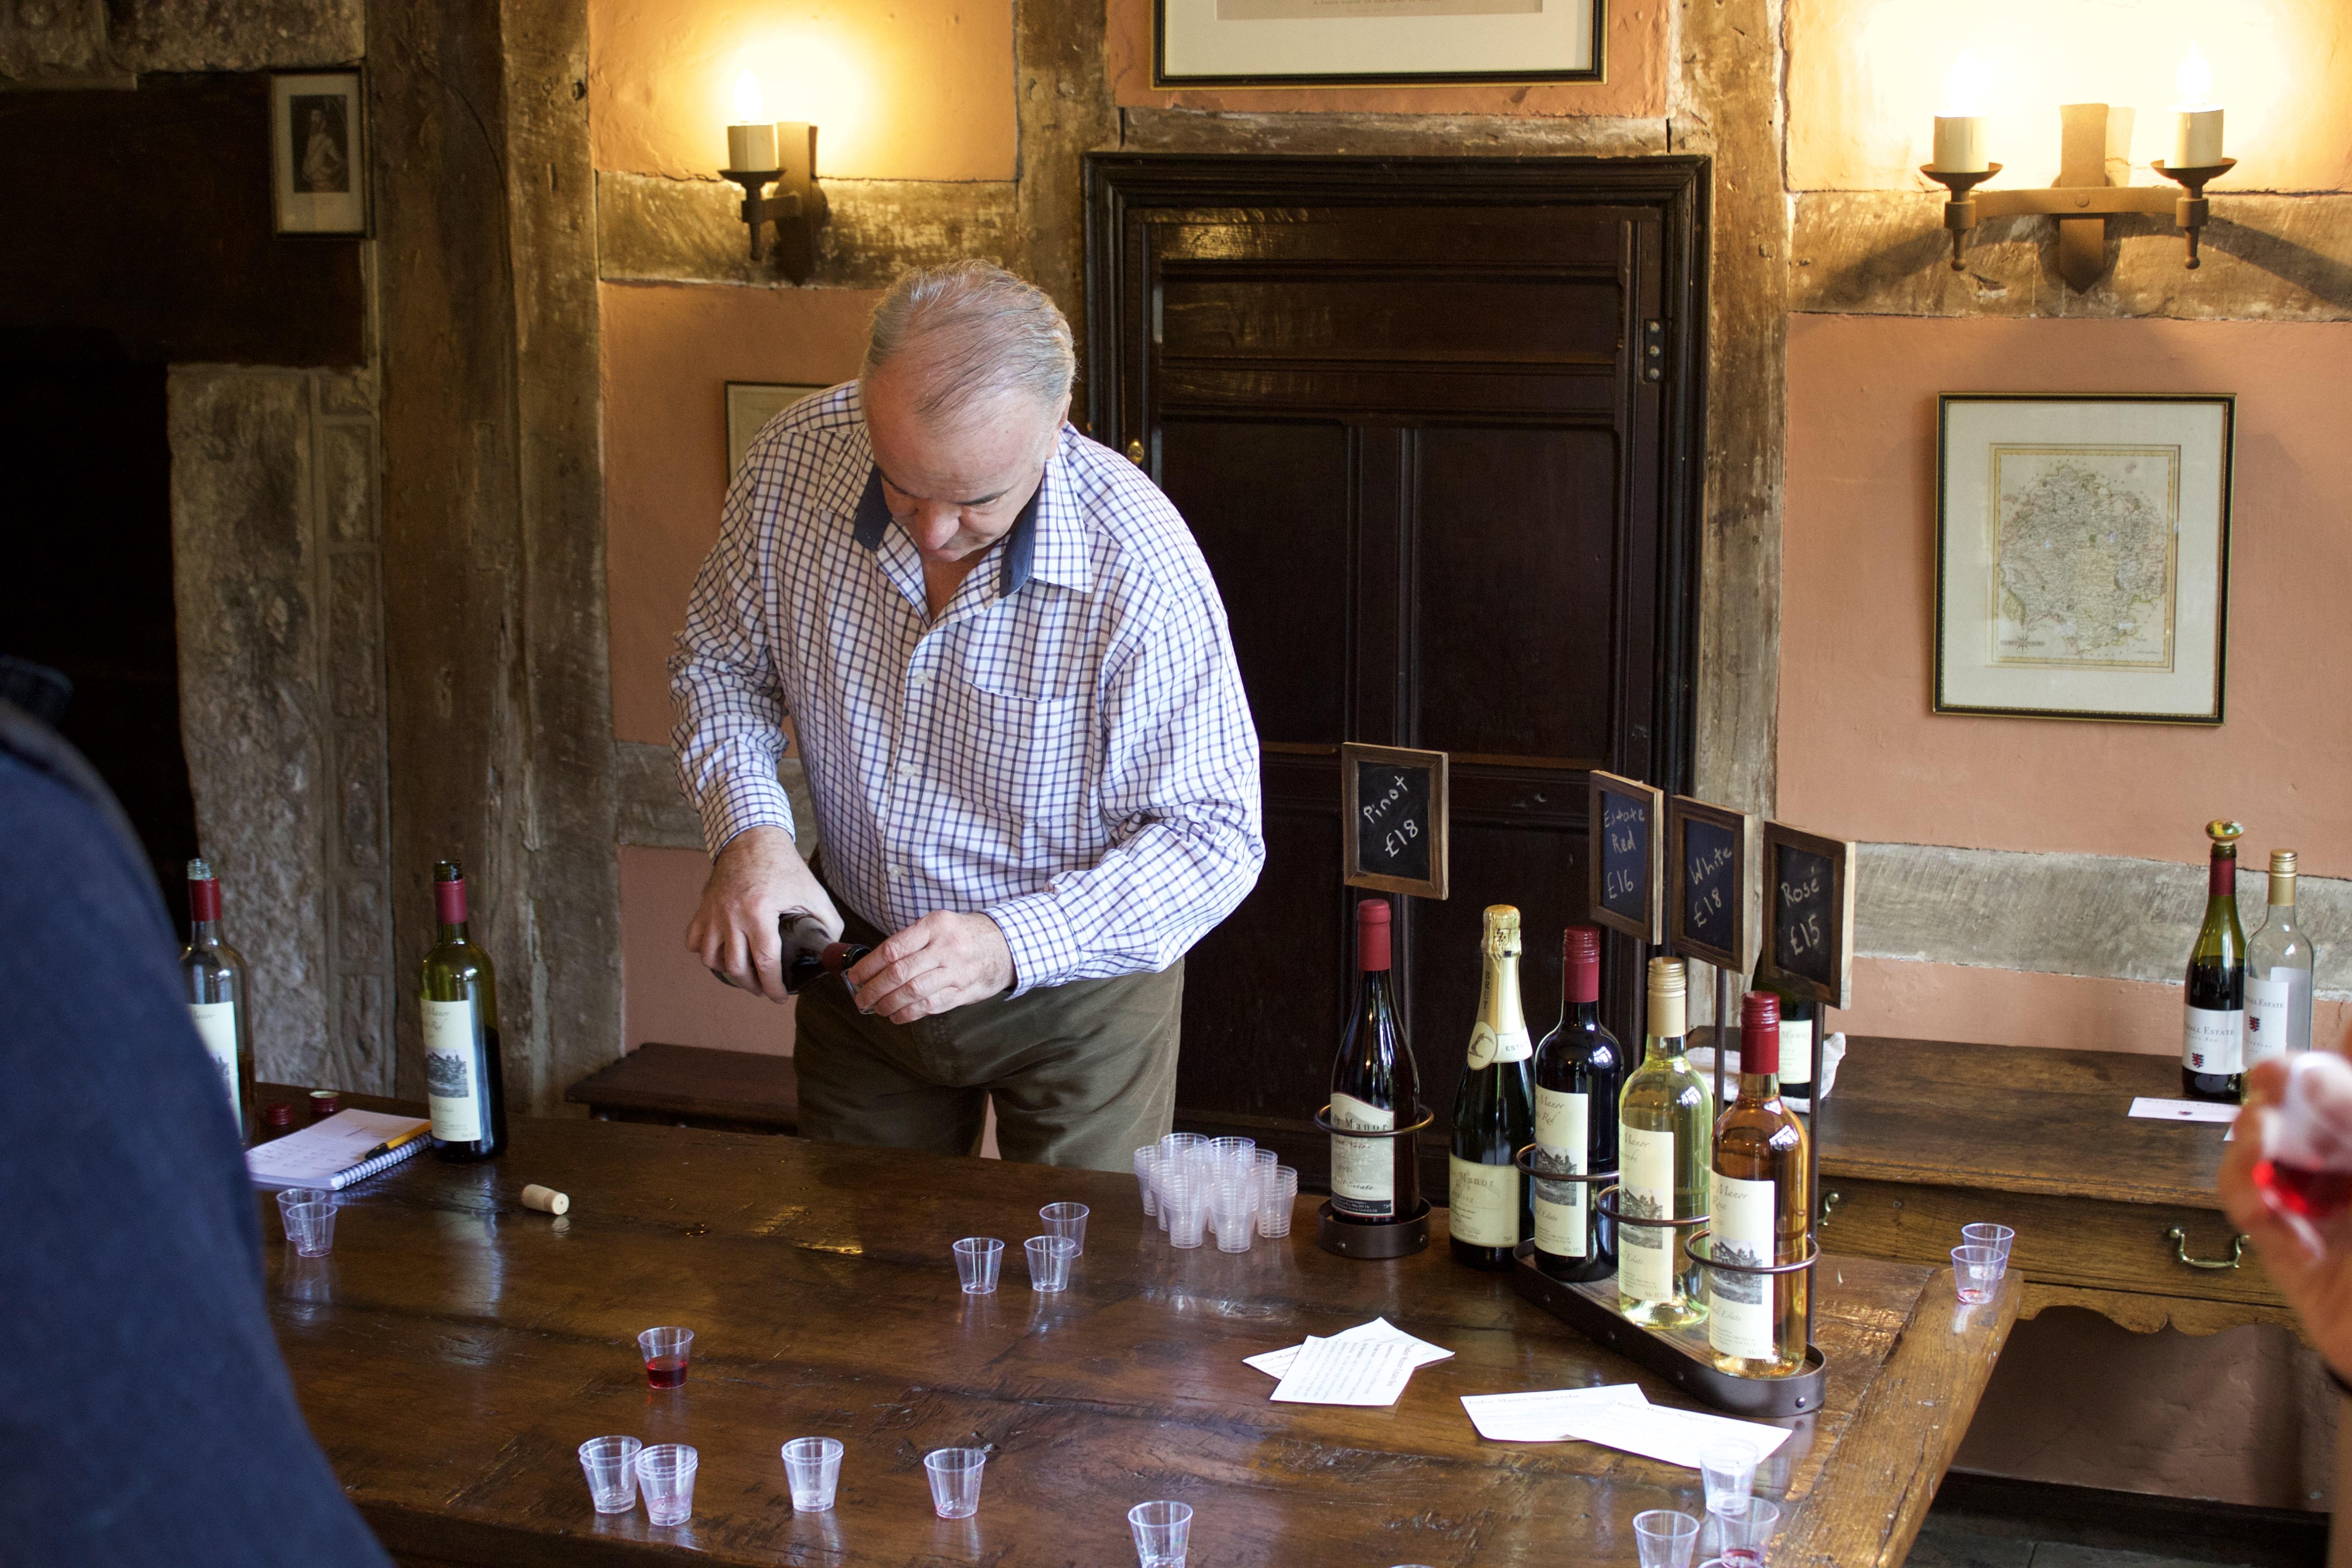 Jamie McIntyre serving wine at wythall estate tour